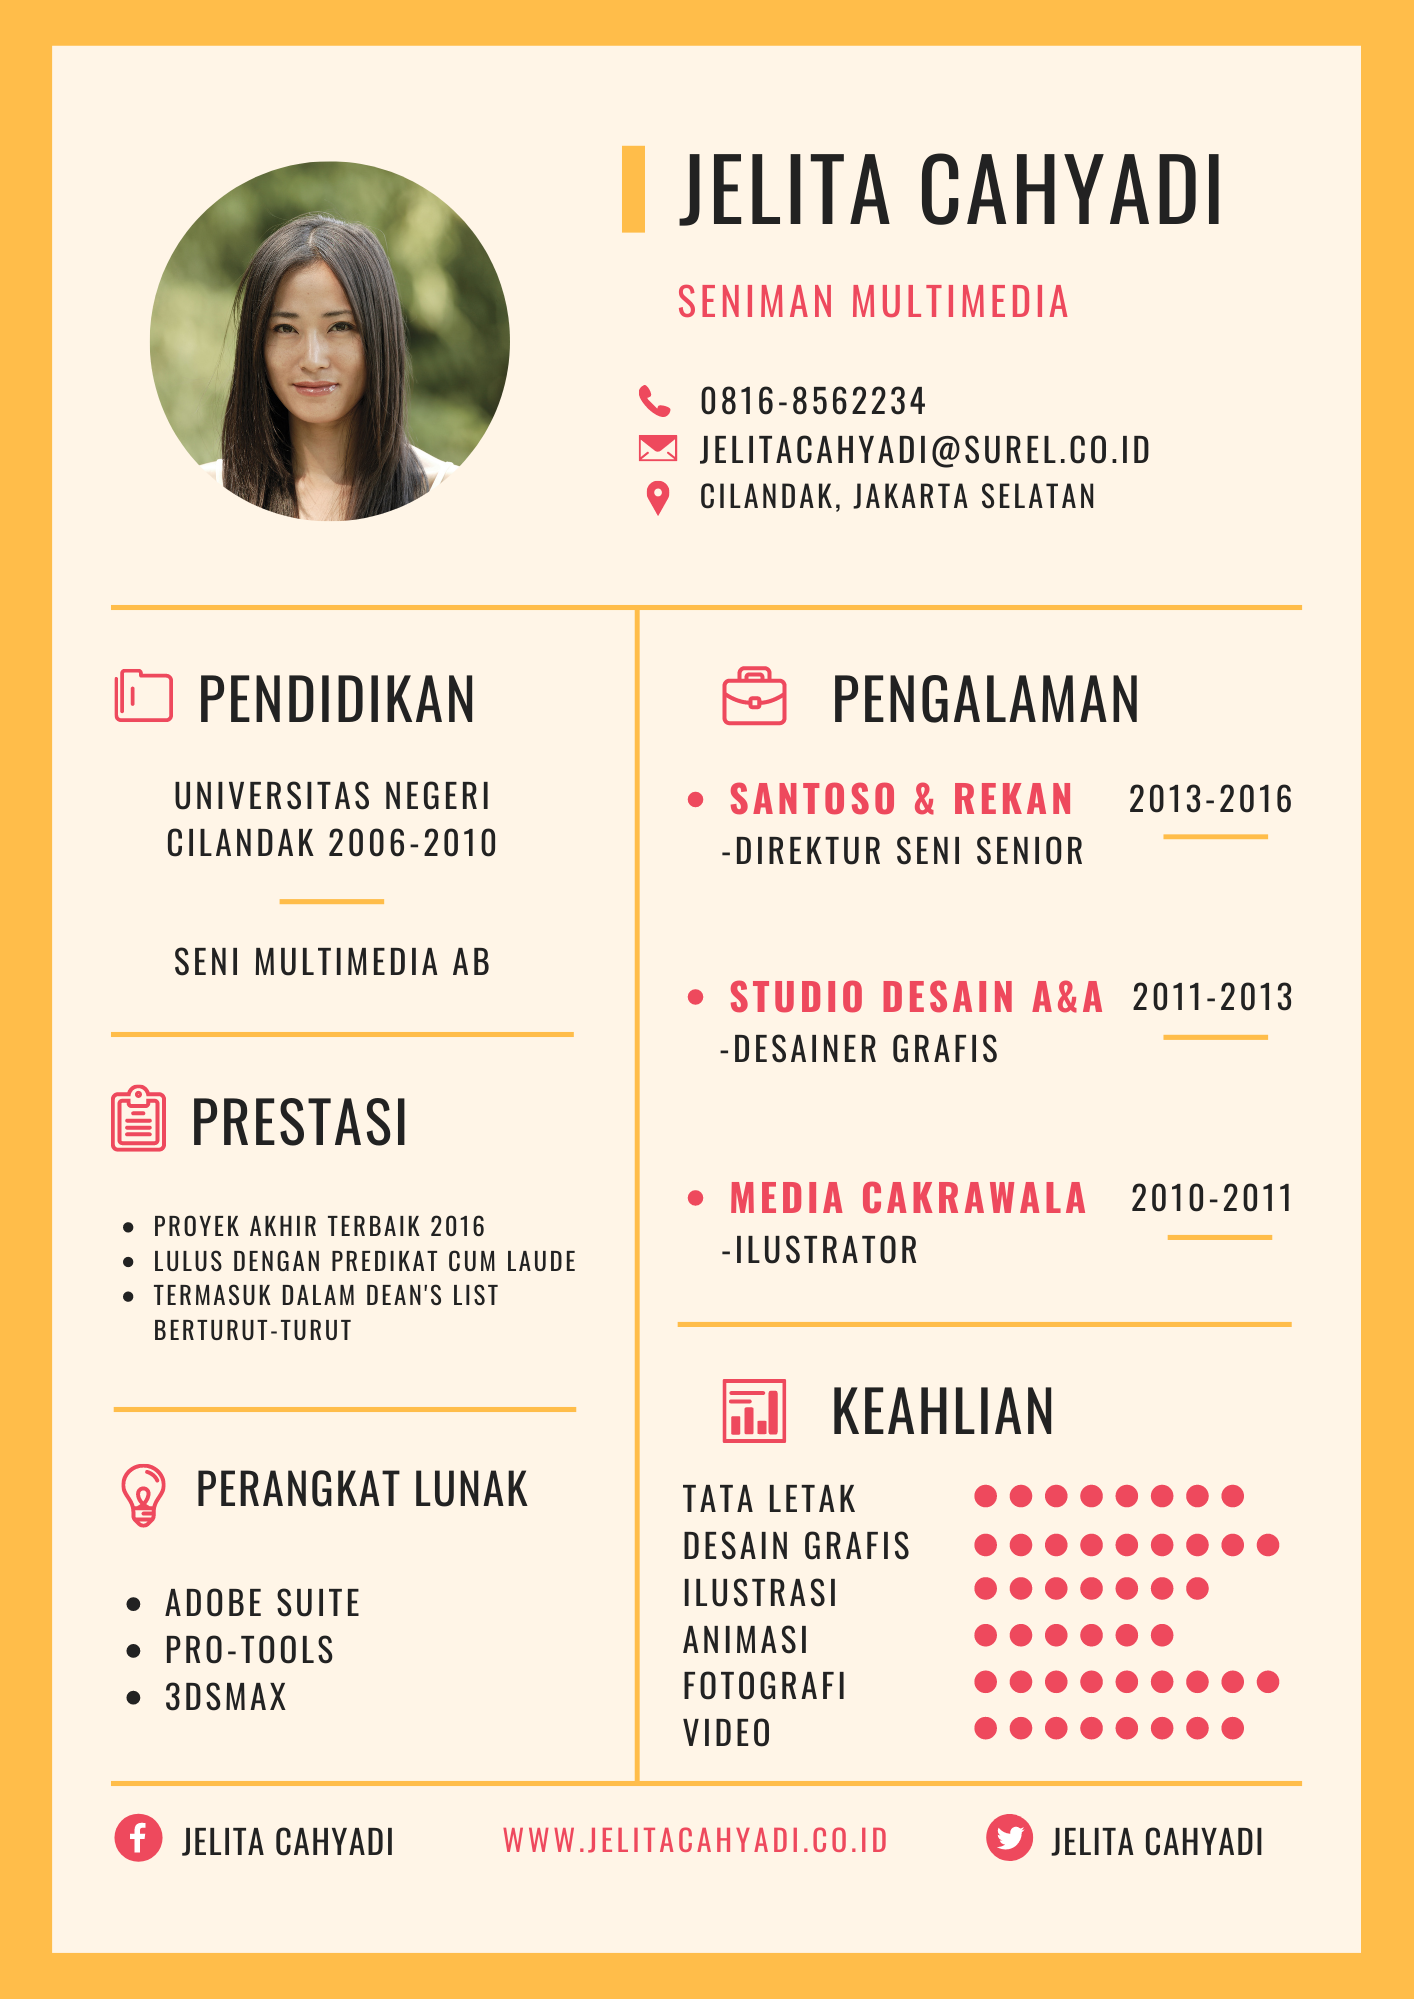 Contoh CV Simple dan Modern